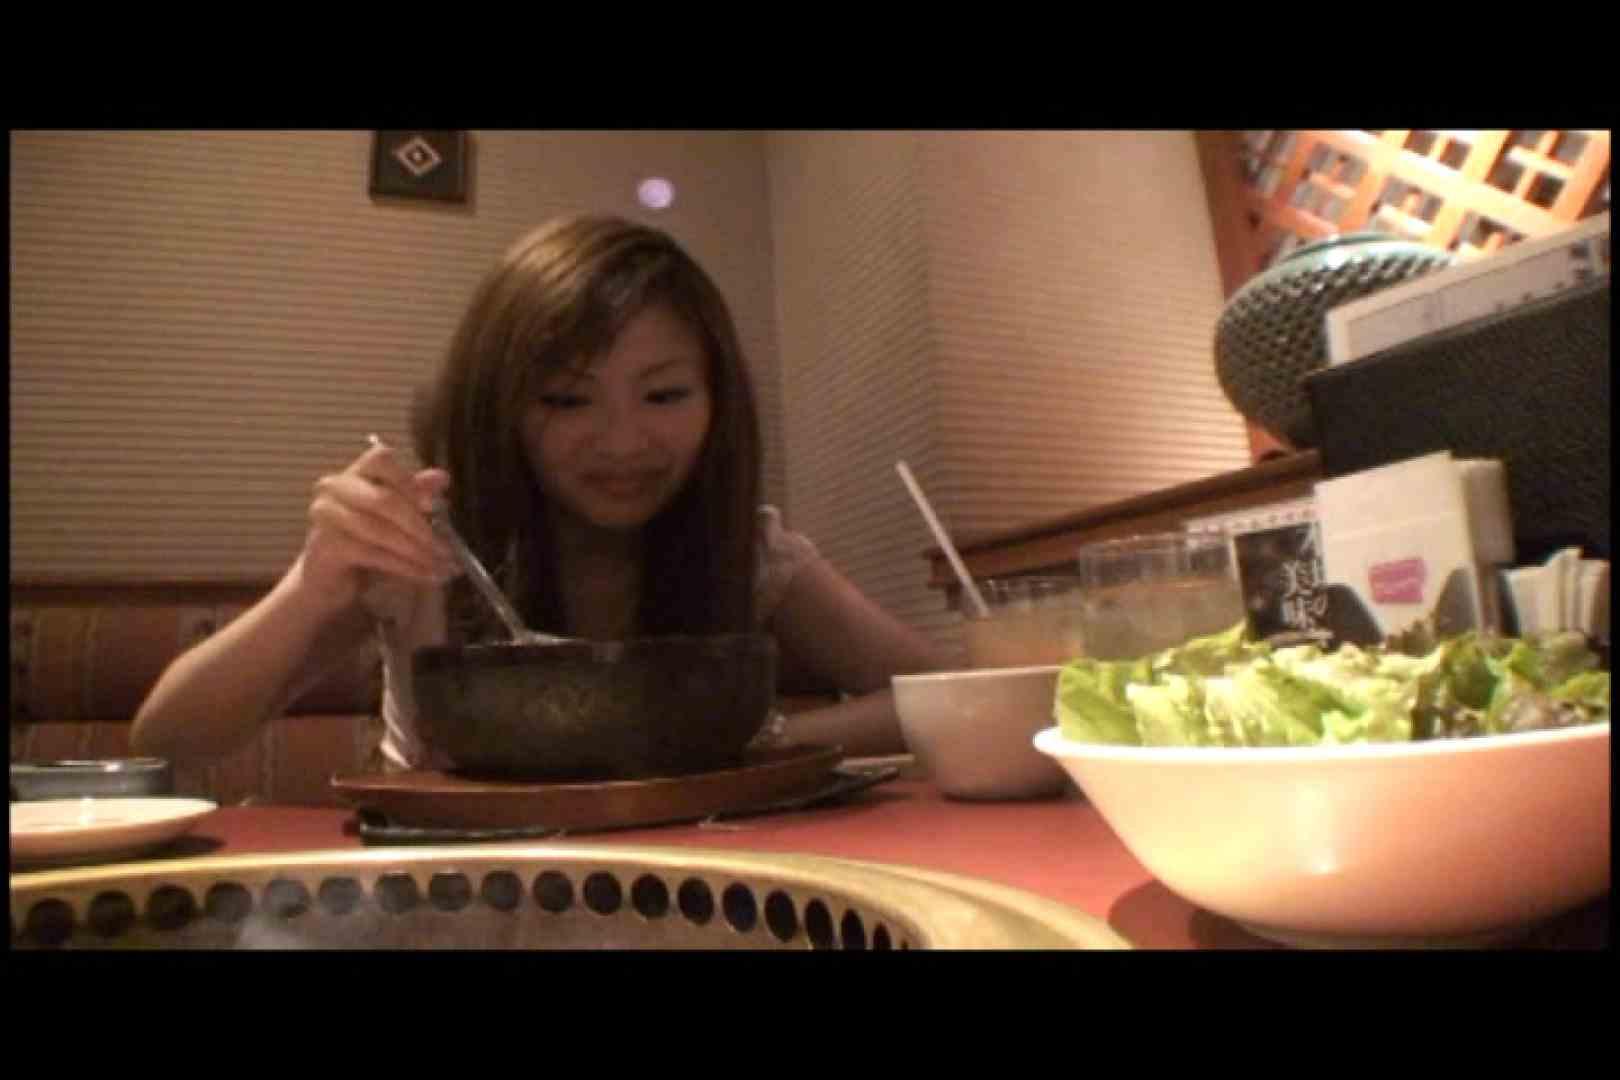 JDハンター全国ツアー vol.052 前編 女子大生のエロ動画 | 0  110PIX 17